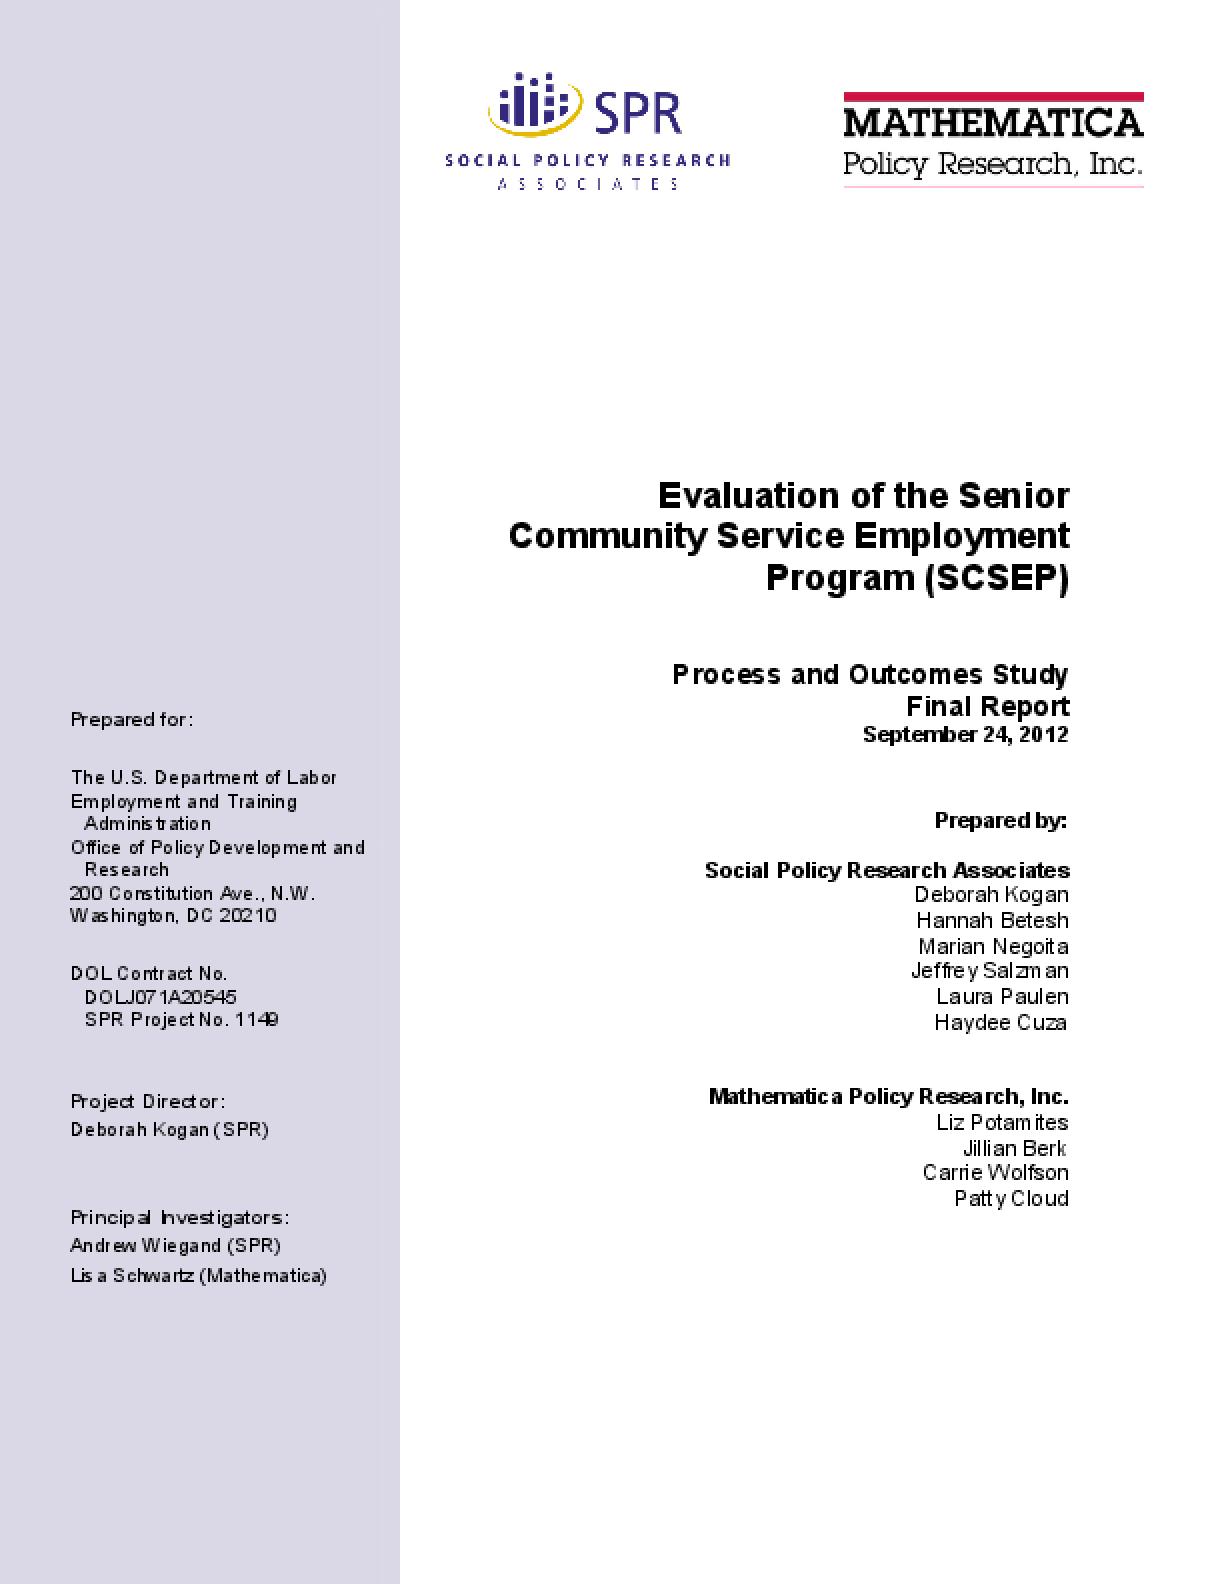 Evaluation of the Senior Community Service Employment Program (SCSEP)